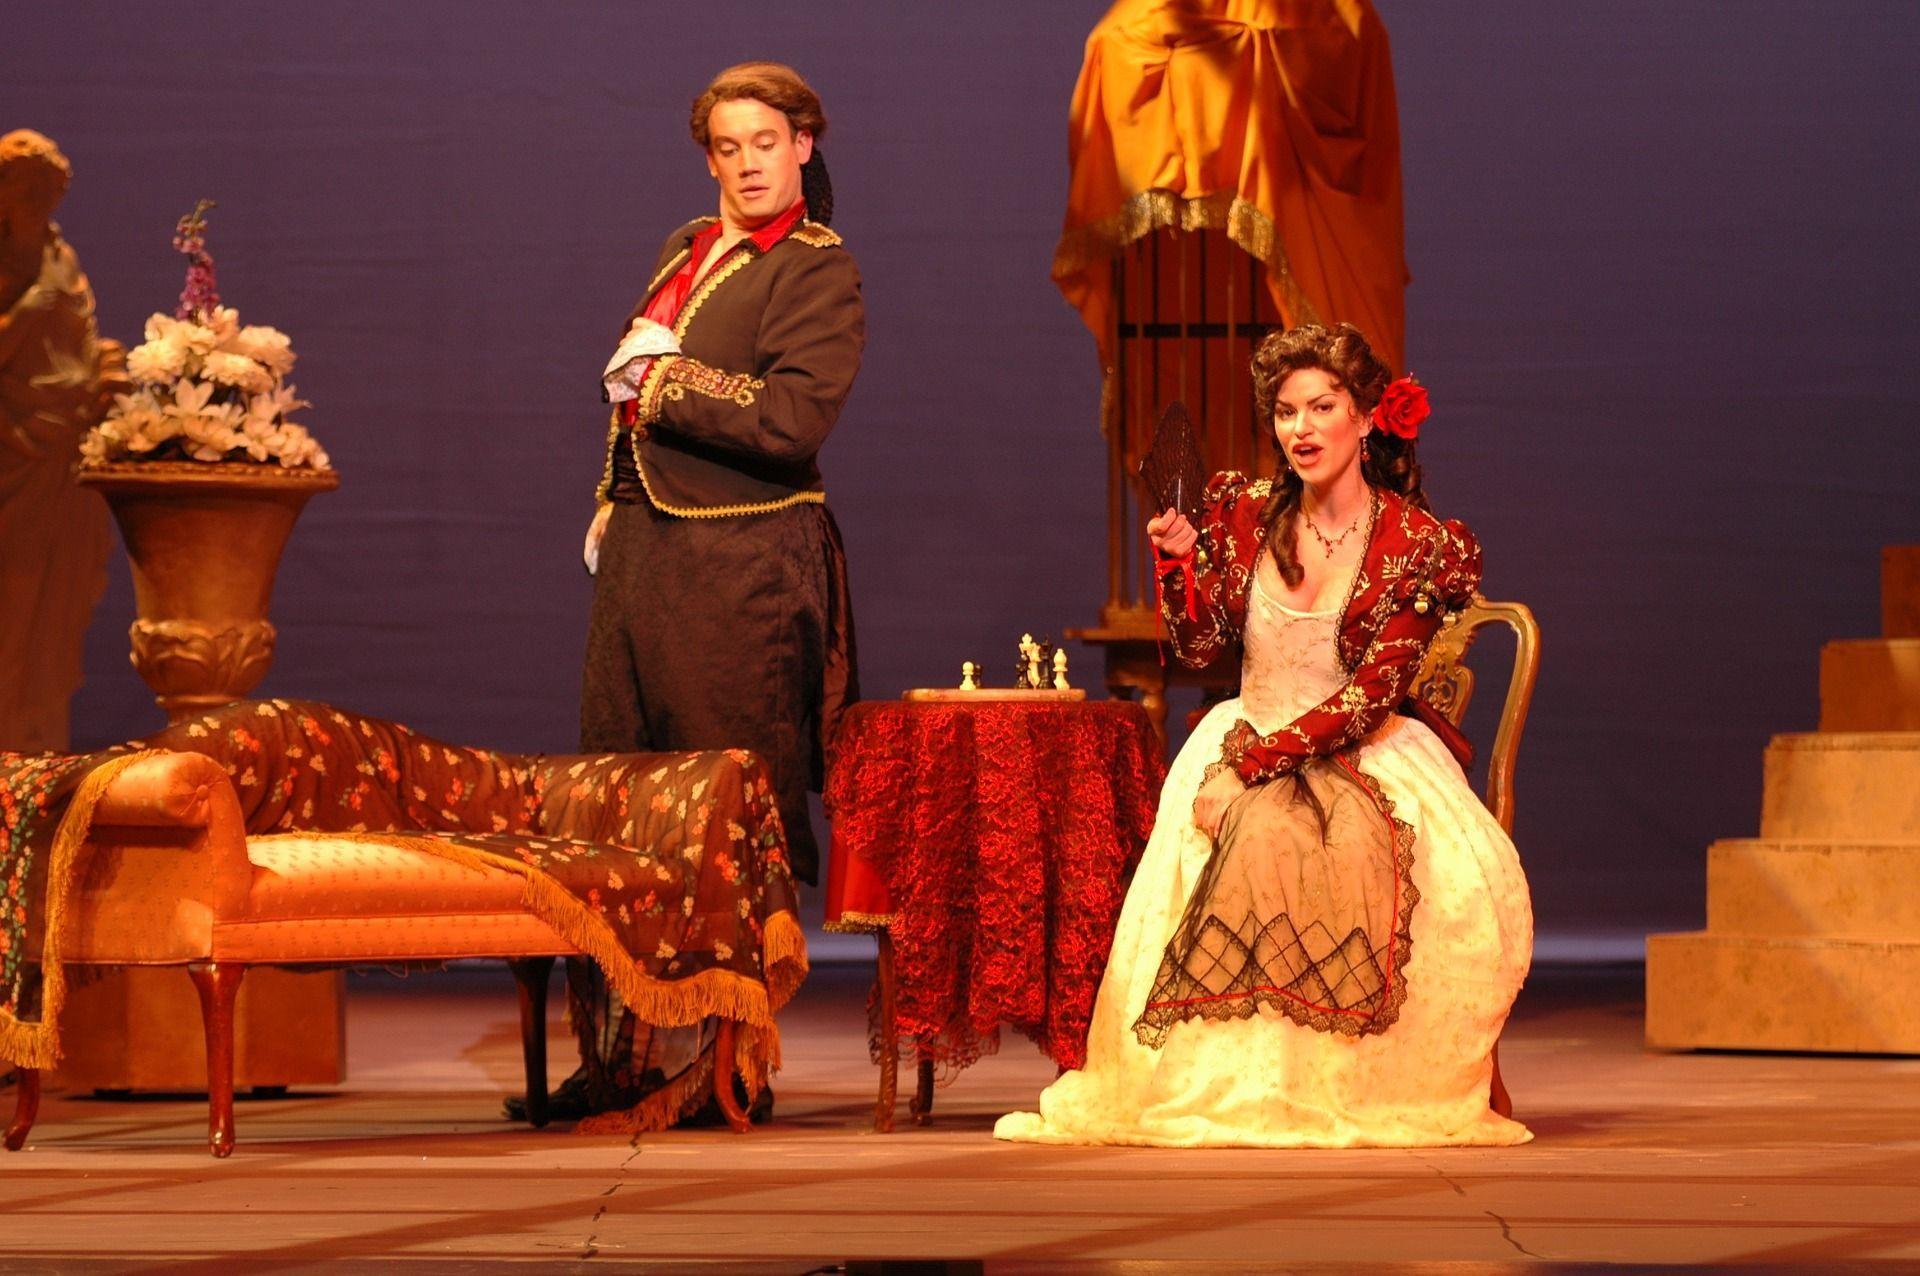 Die Oper in Sevilla